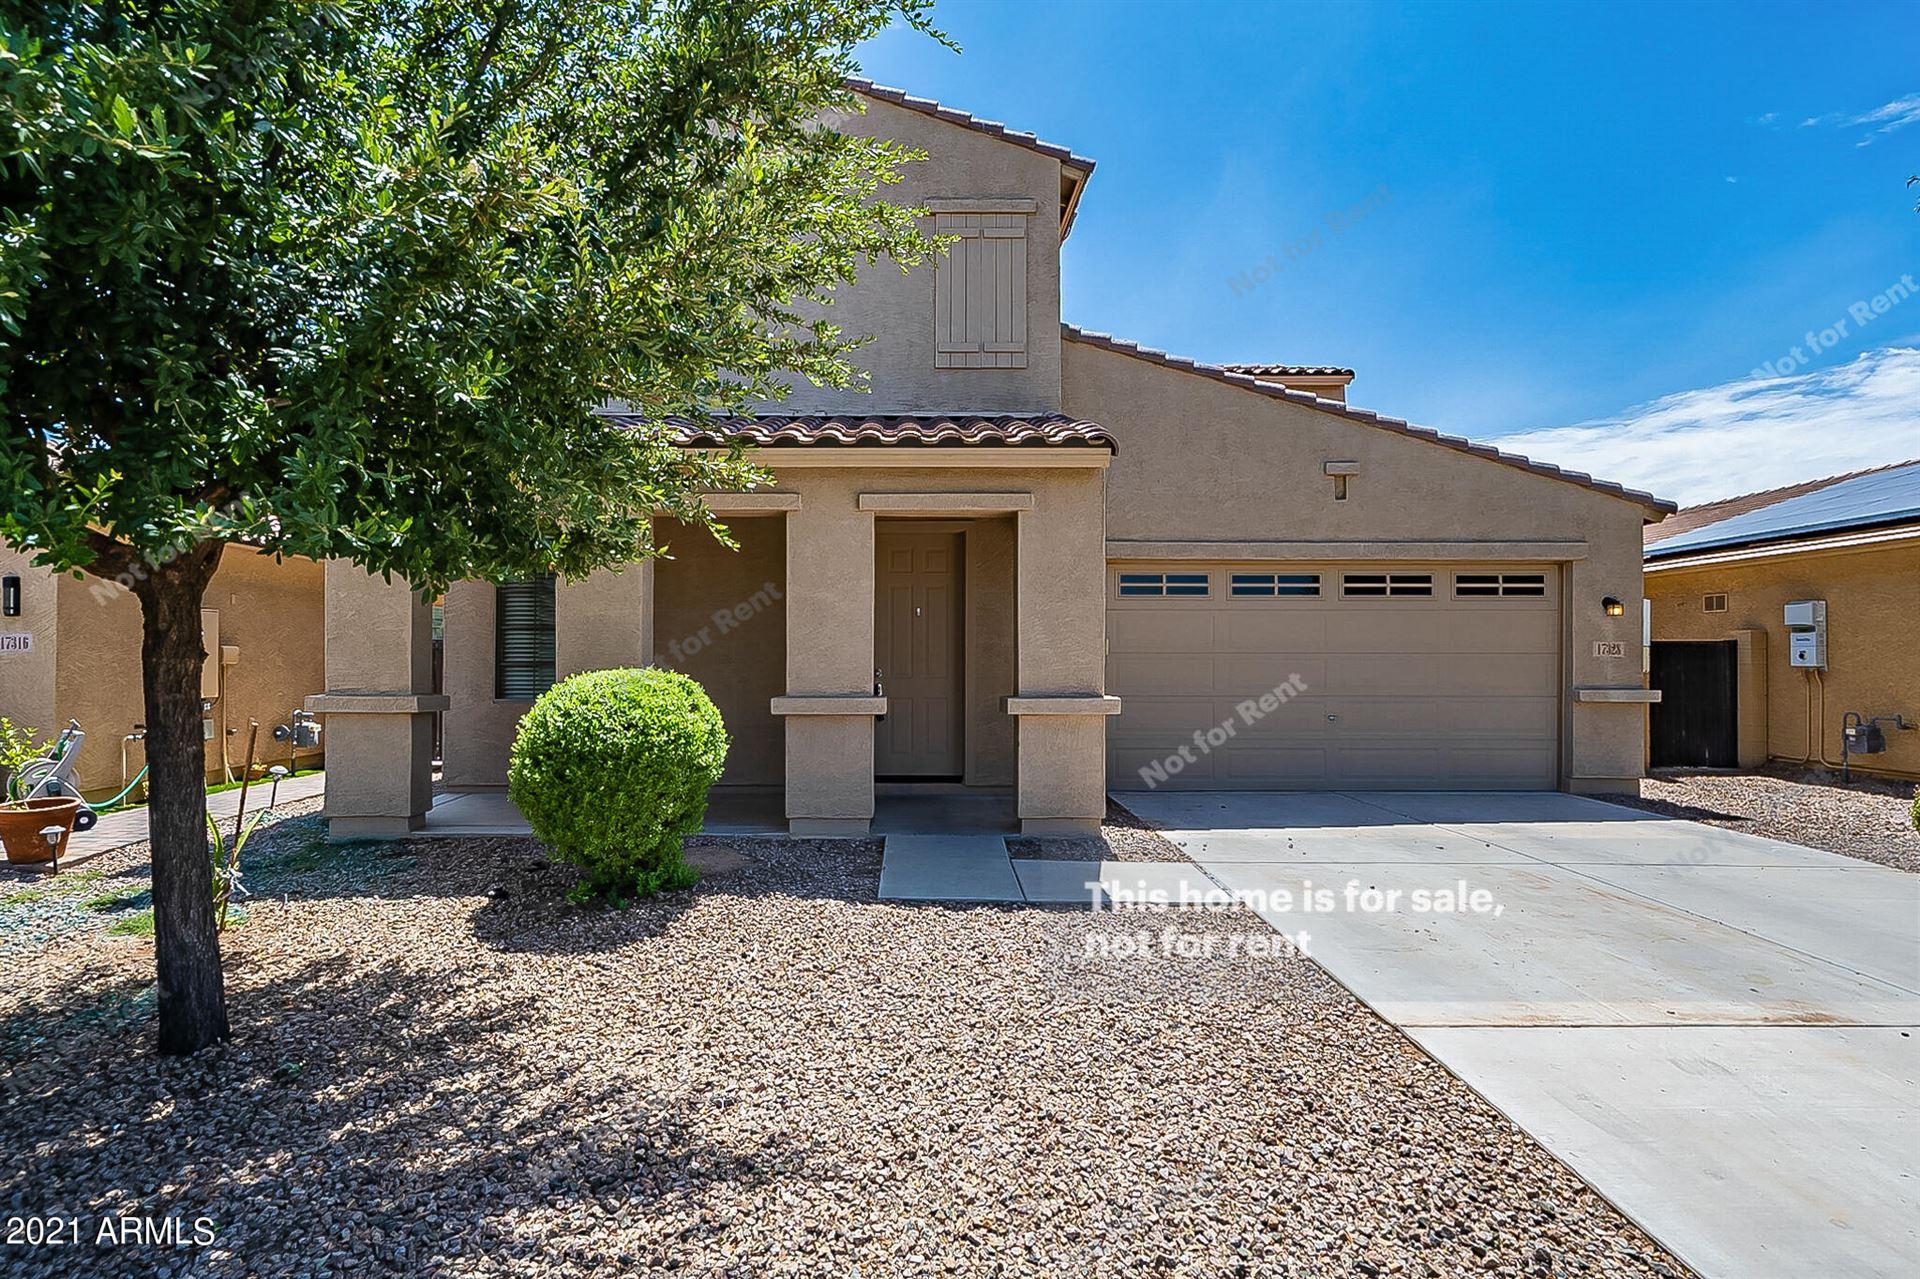 Photo for 17328 N ROSA Drive, Maricopa, AZ 85138 (MLS # 6262008)